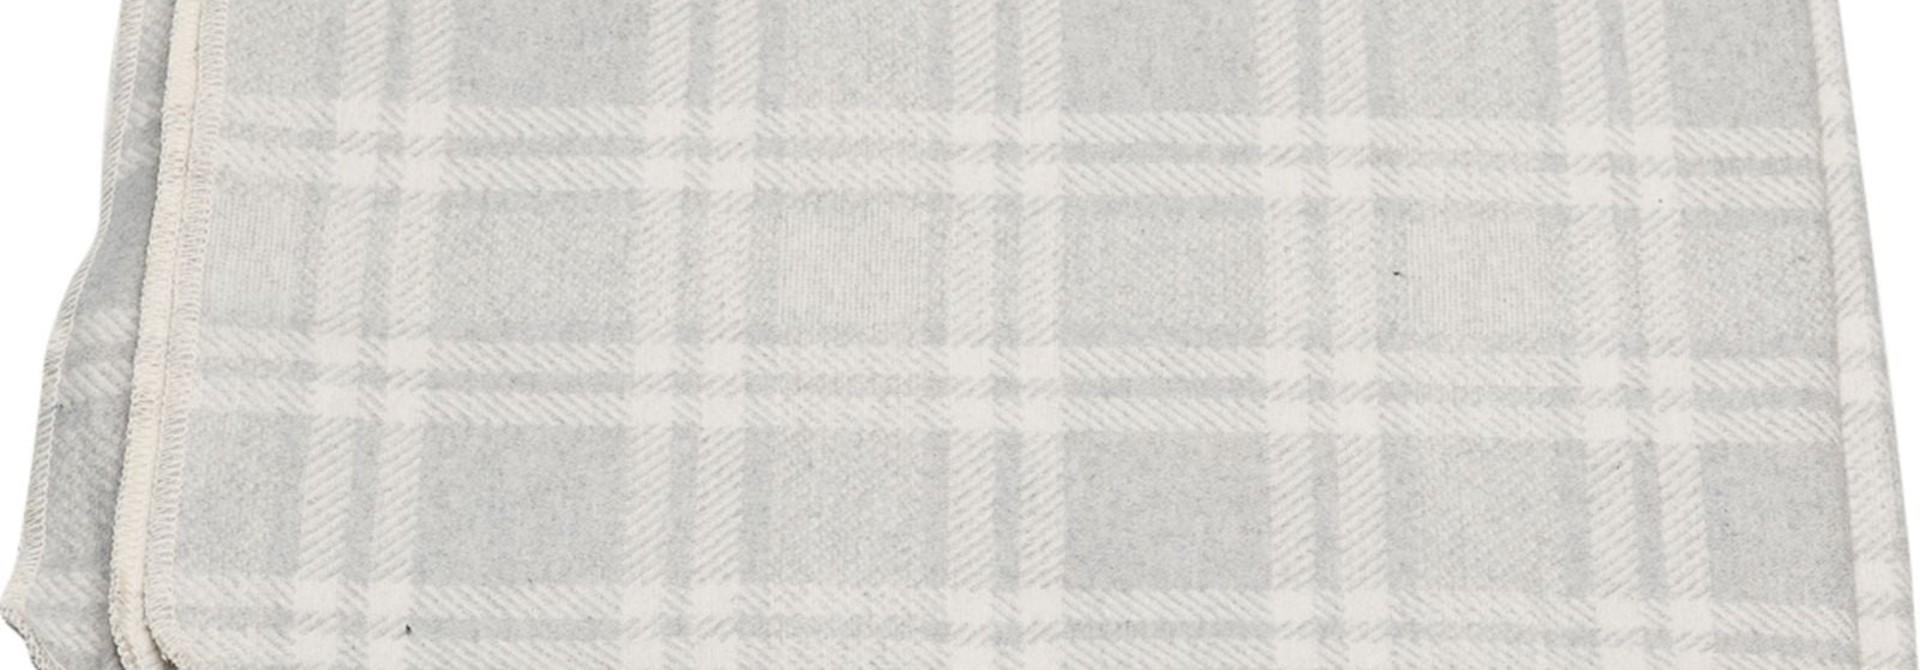 Blanket - Checkered - Light Grey